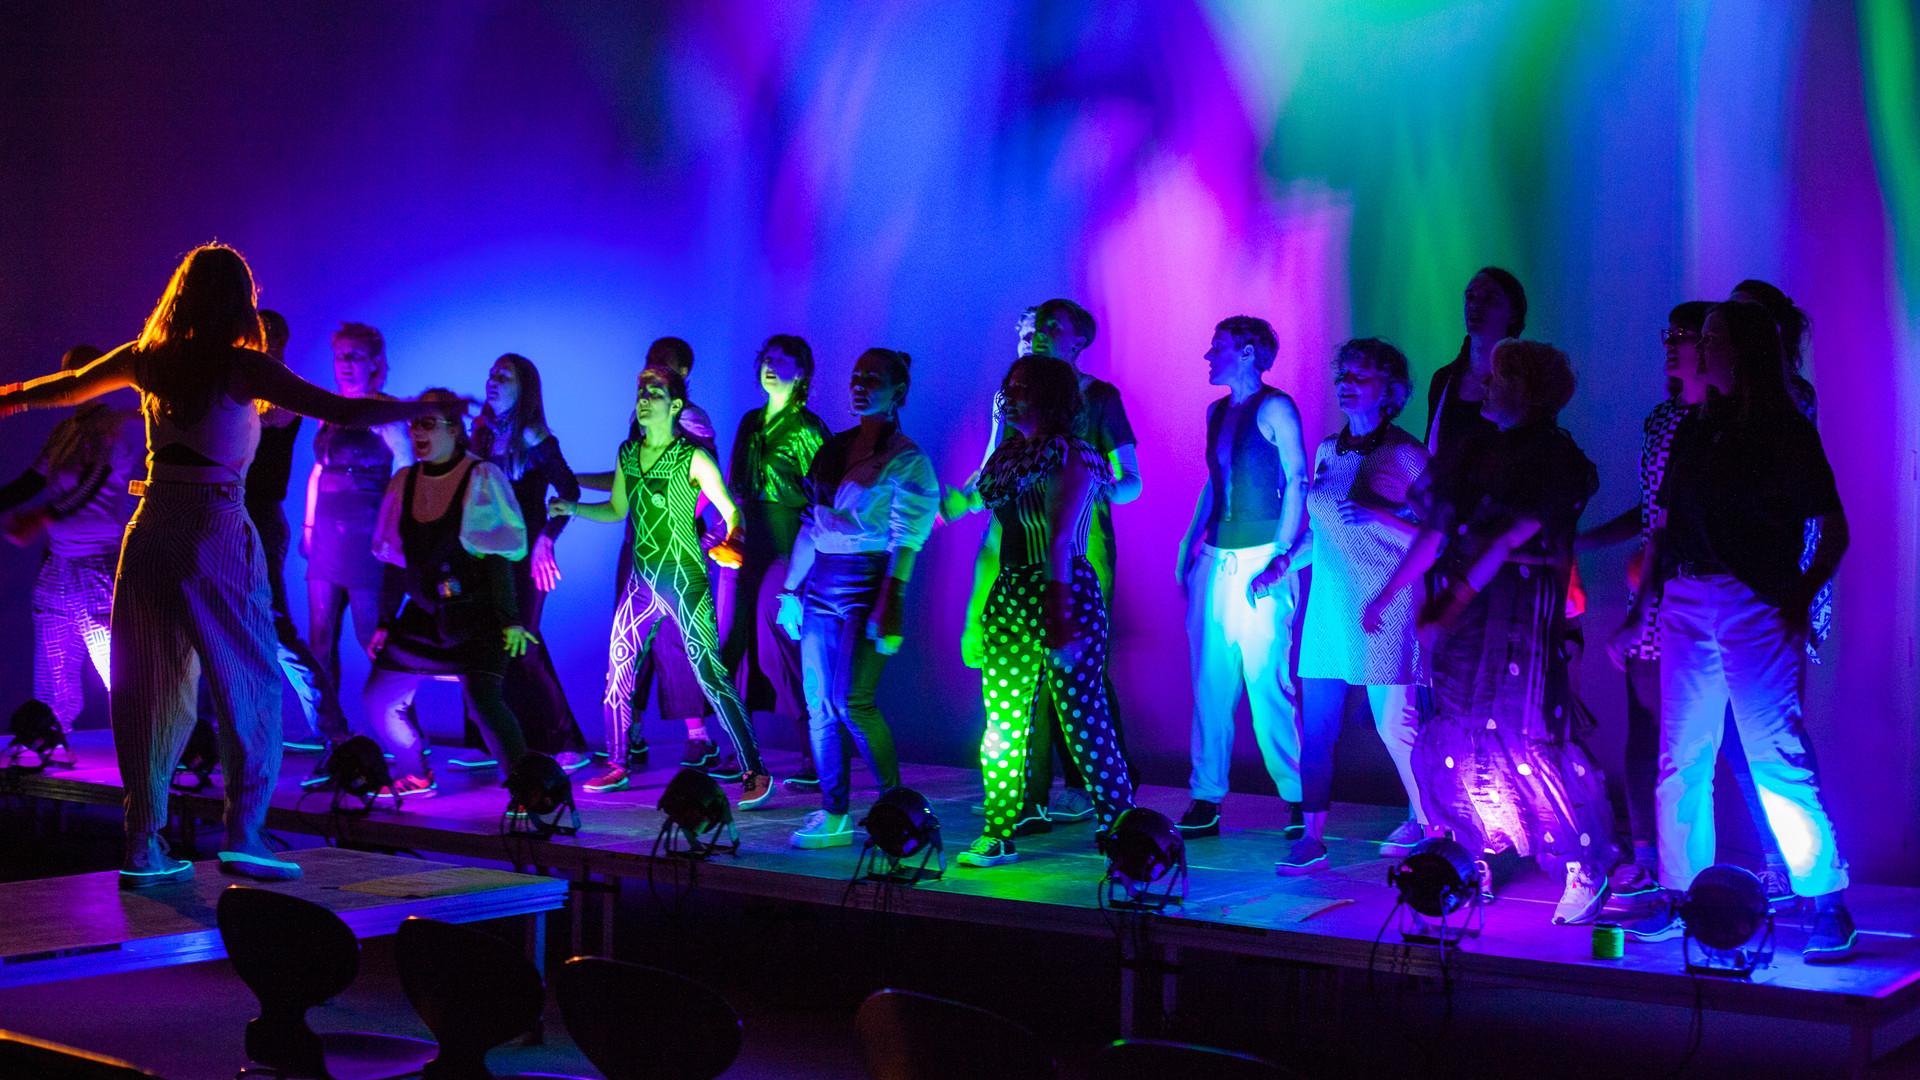 Not Dancing, Fighting - Borealis Festival, 2020